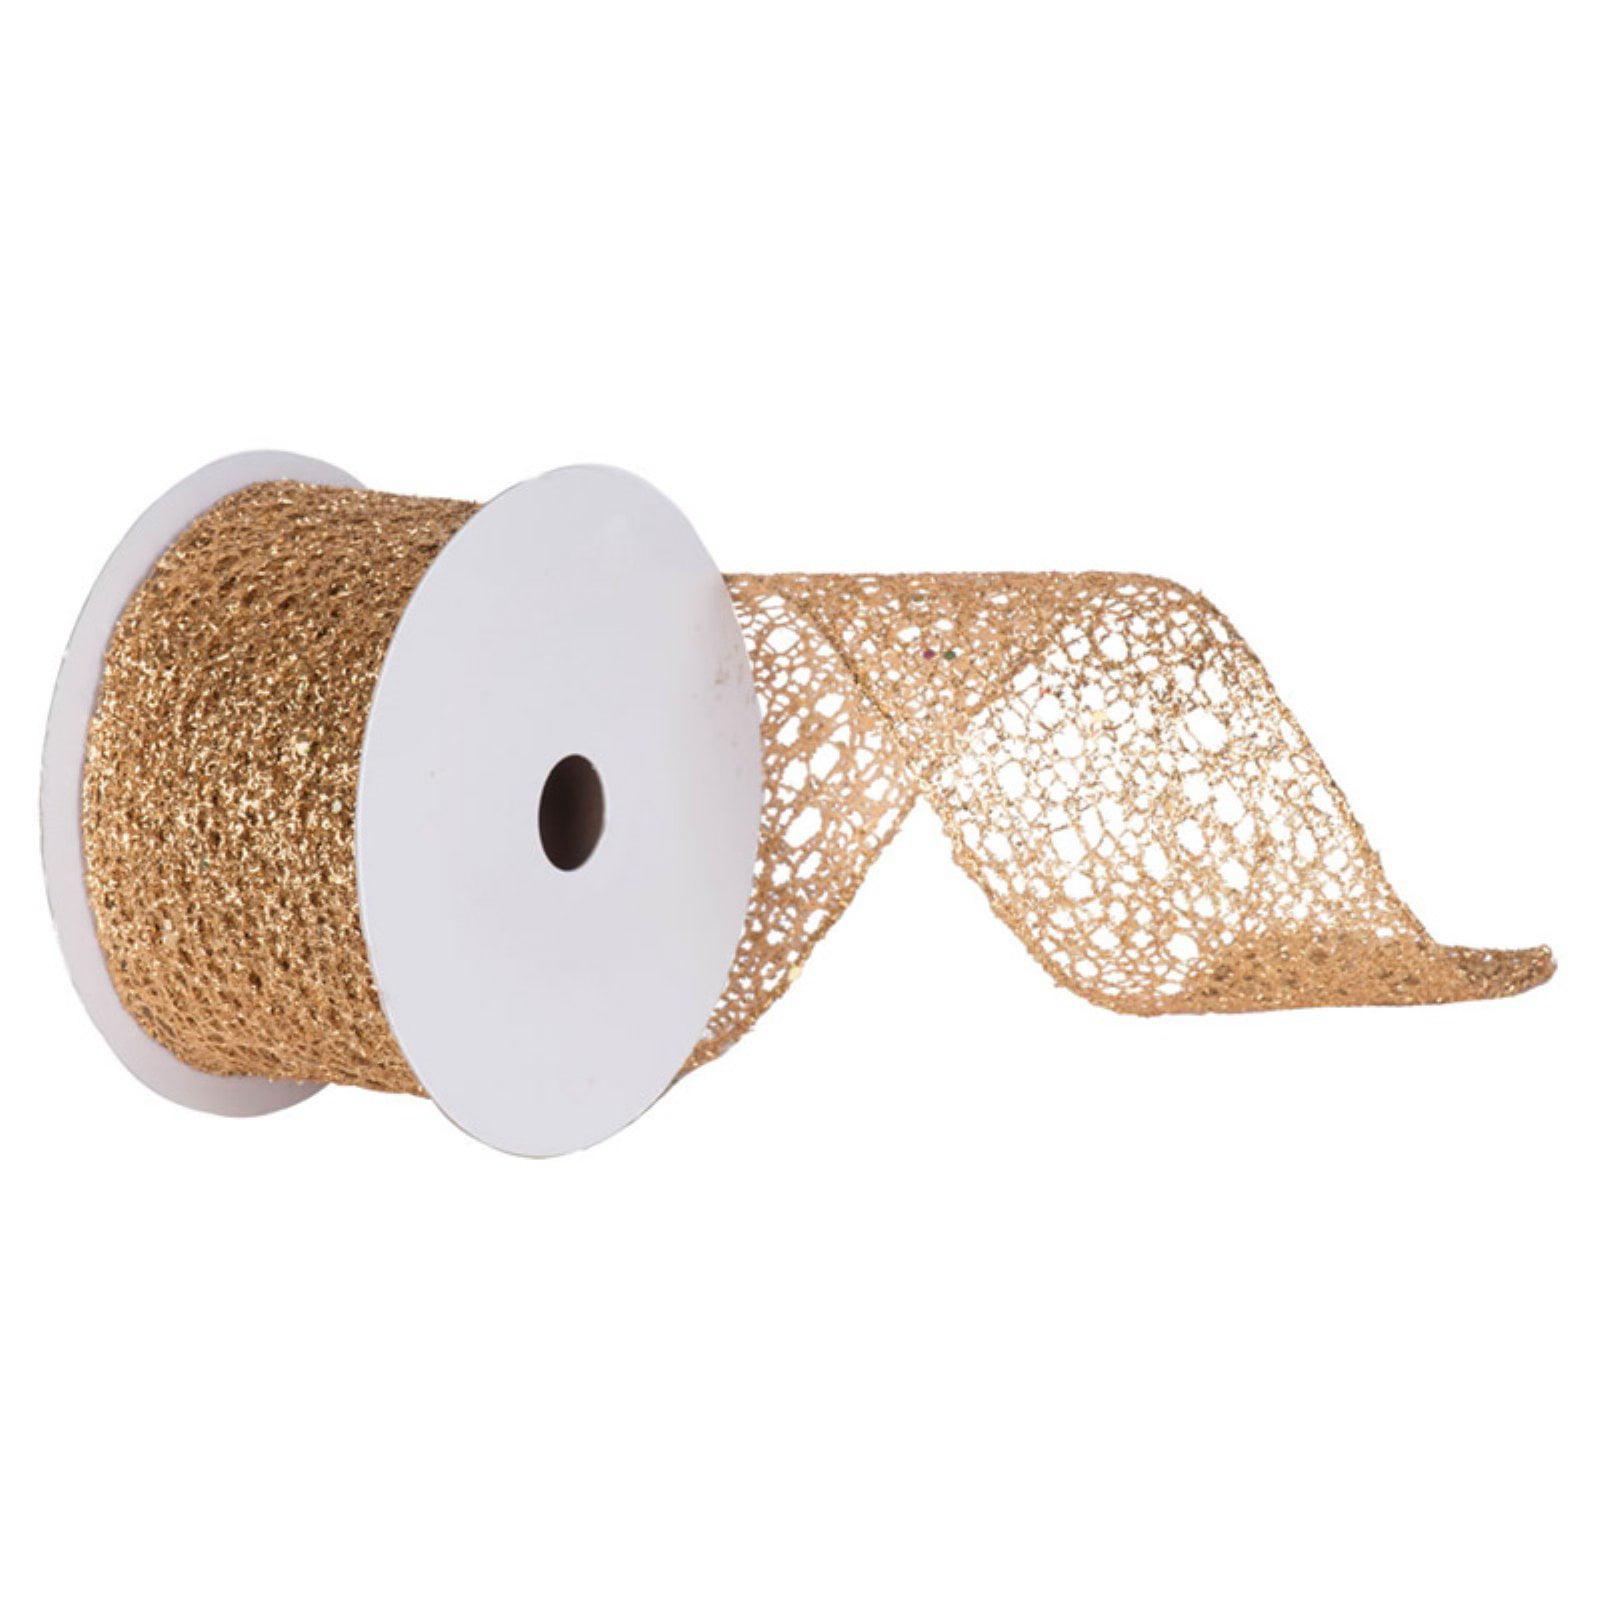 "Vickerman 2.5"" Gold Glitter Mesh Christmas and Craft Ribbon"